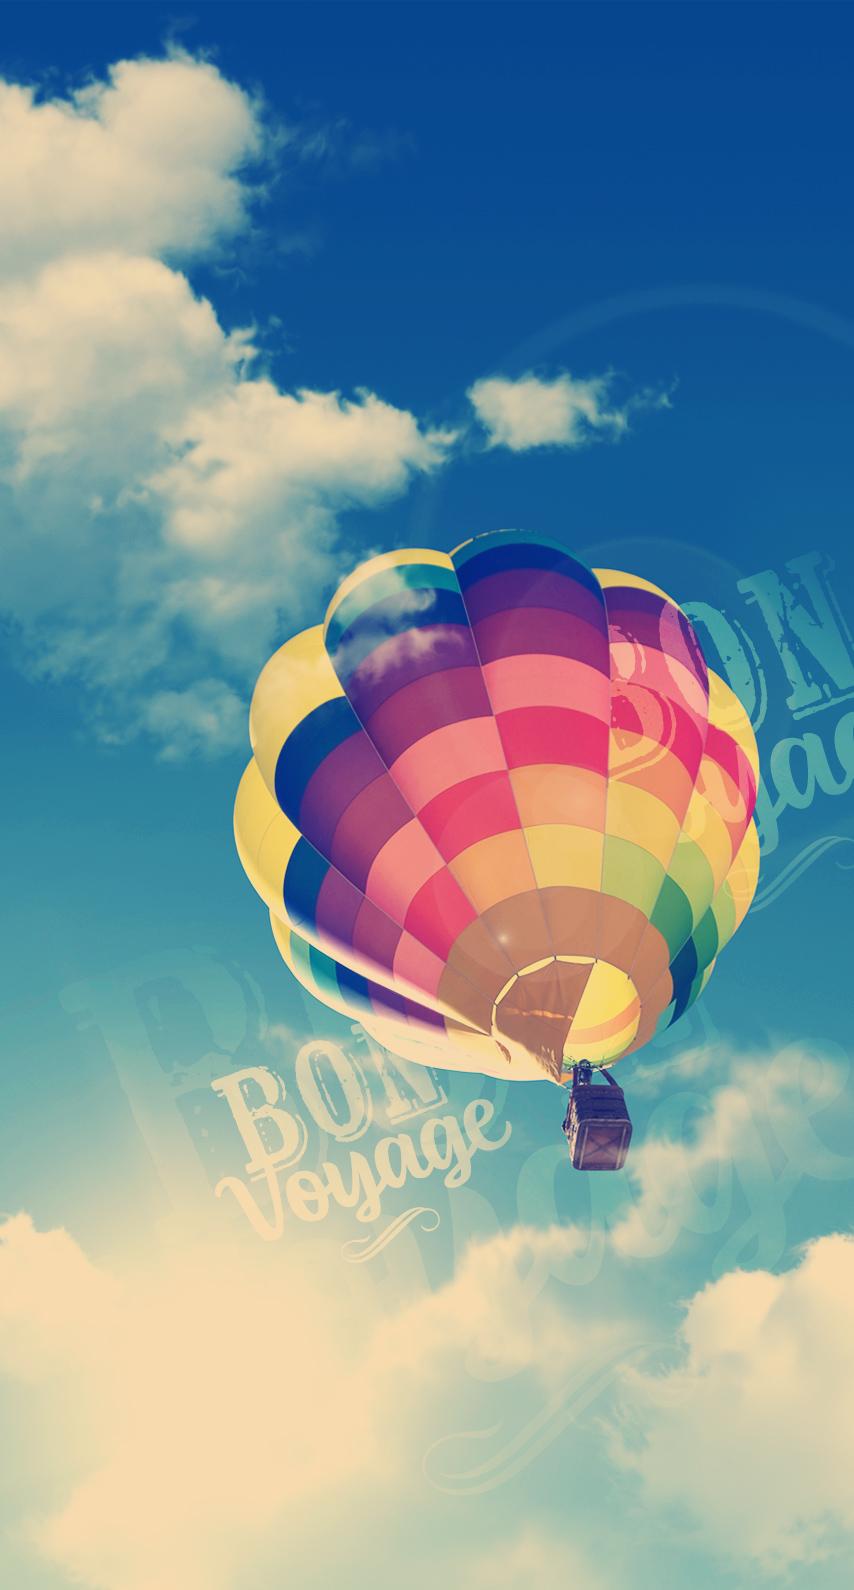 wind, freedom